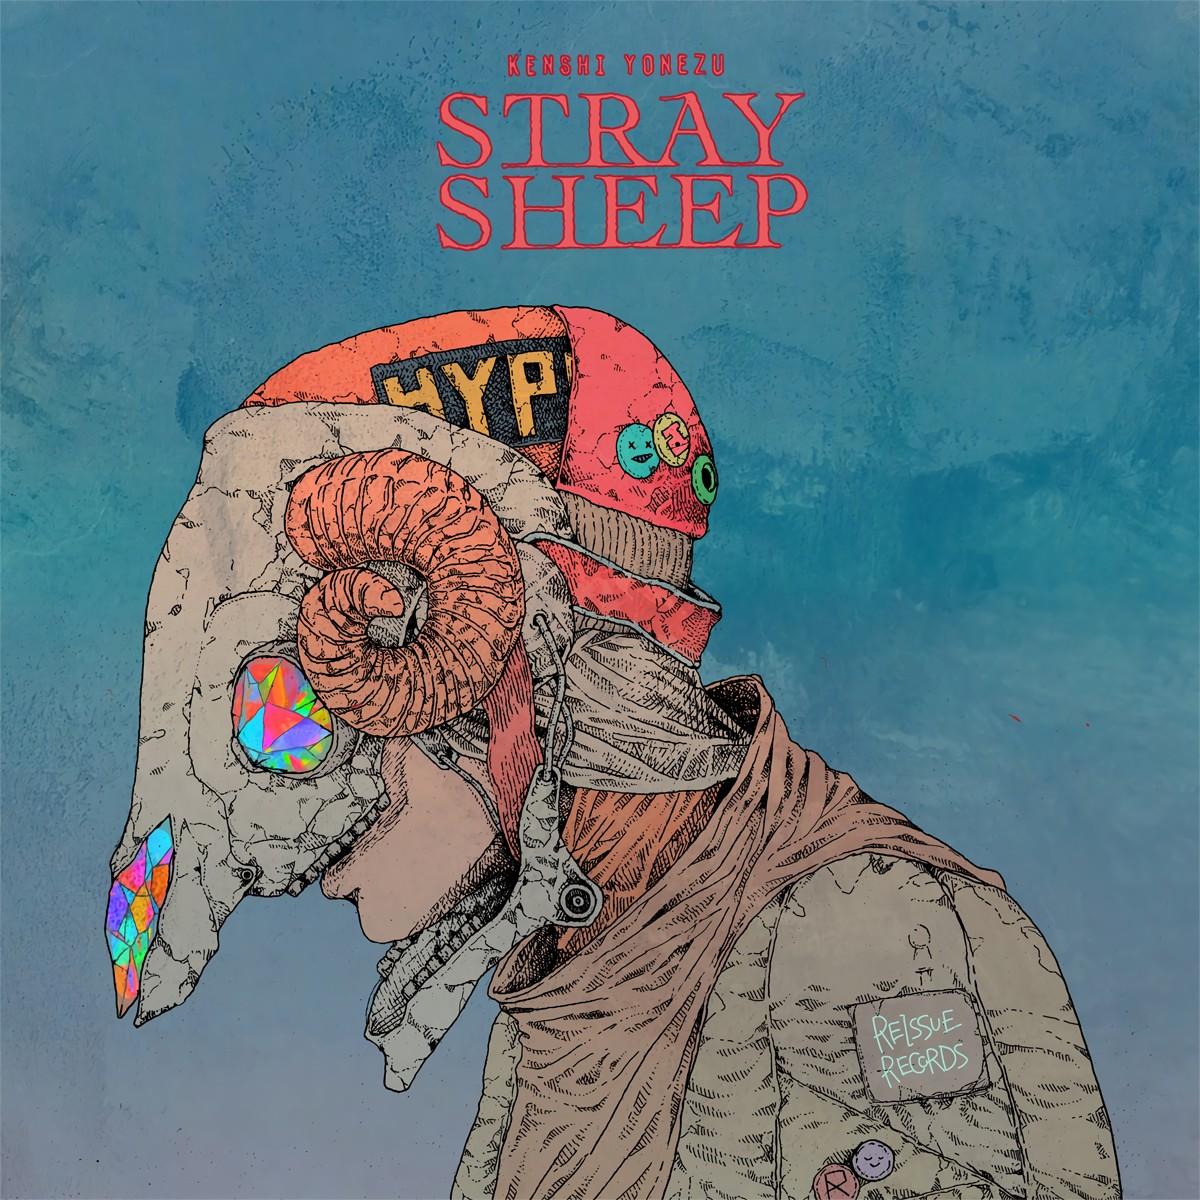 [Album] 米津玄師 (Kenshi Yonezu) – STRAY SHEEP [CD FLAC] [2020.08.05]